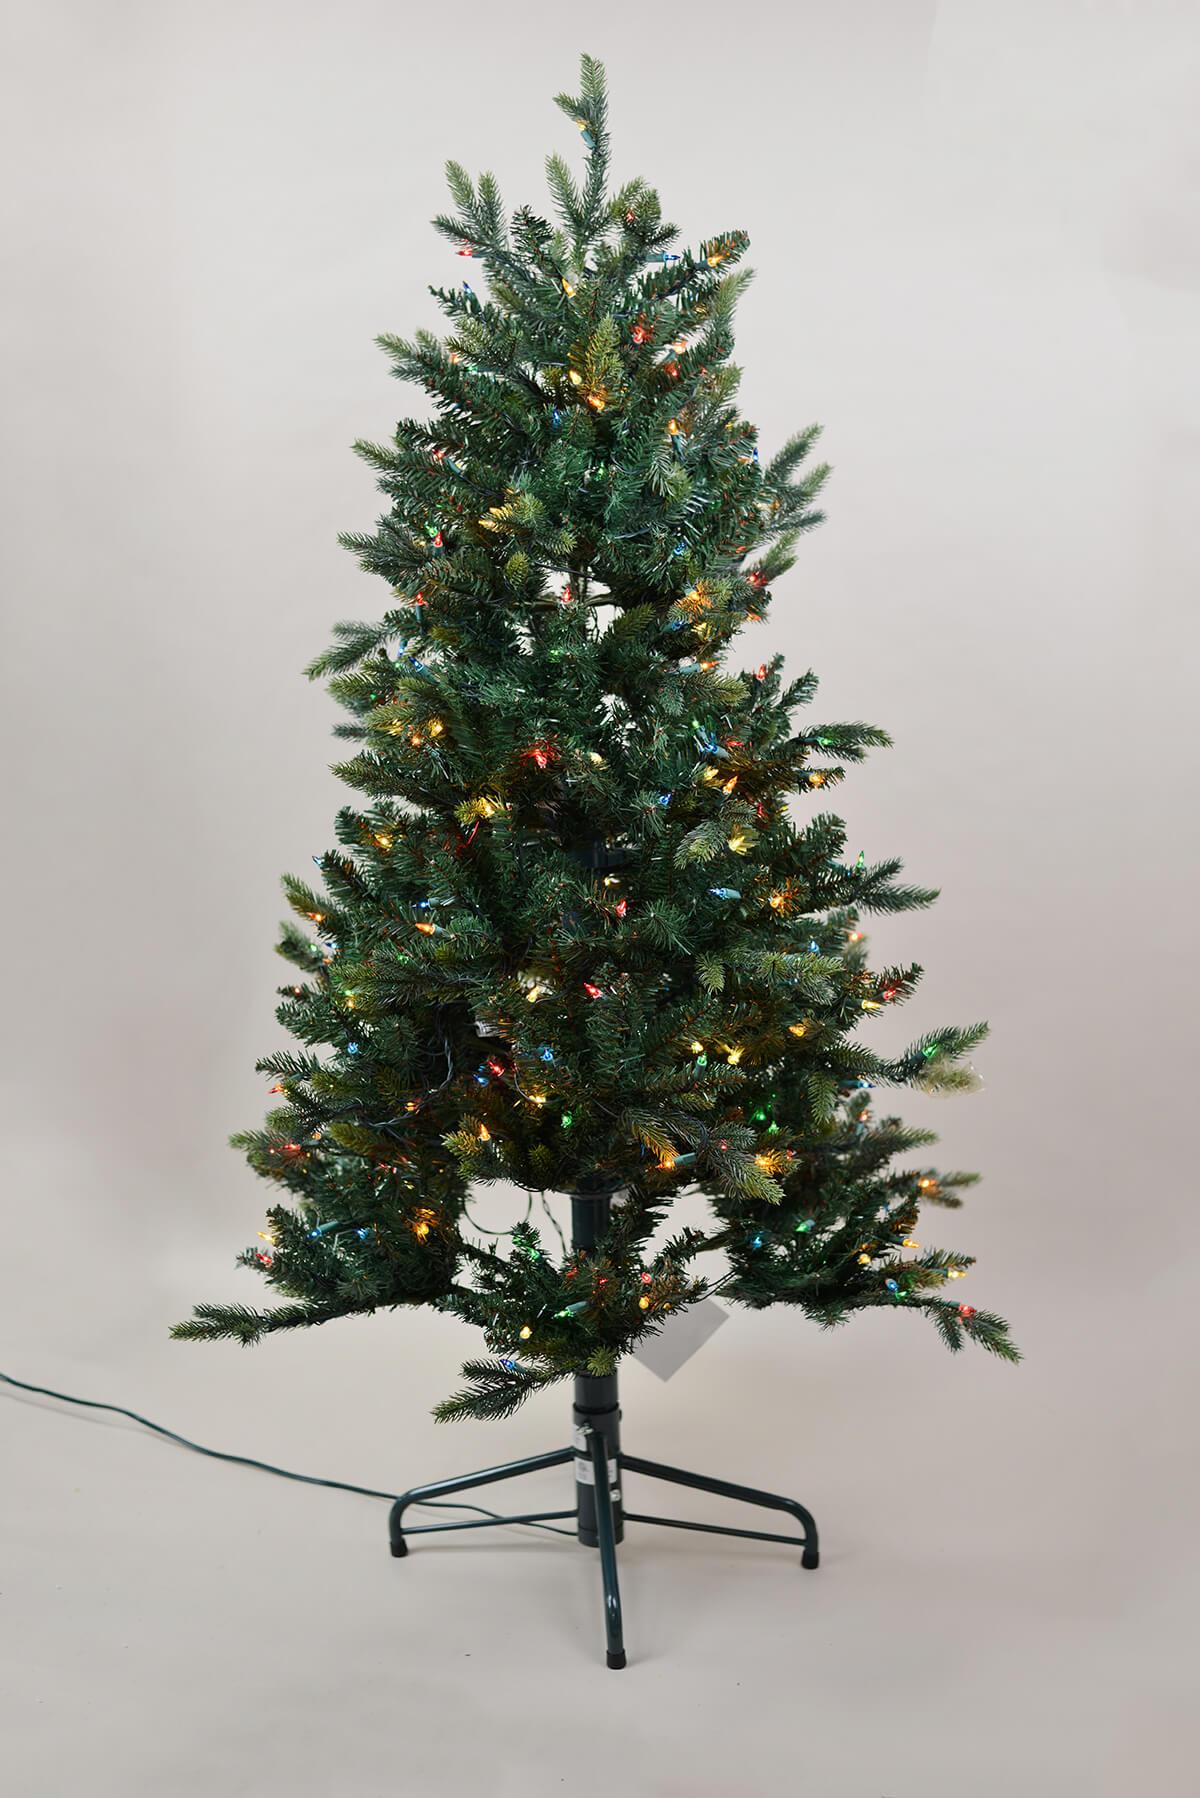 5 foot lighted pine christmas tree - 5 Foot Christmas Tree